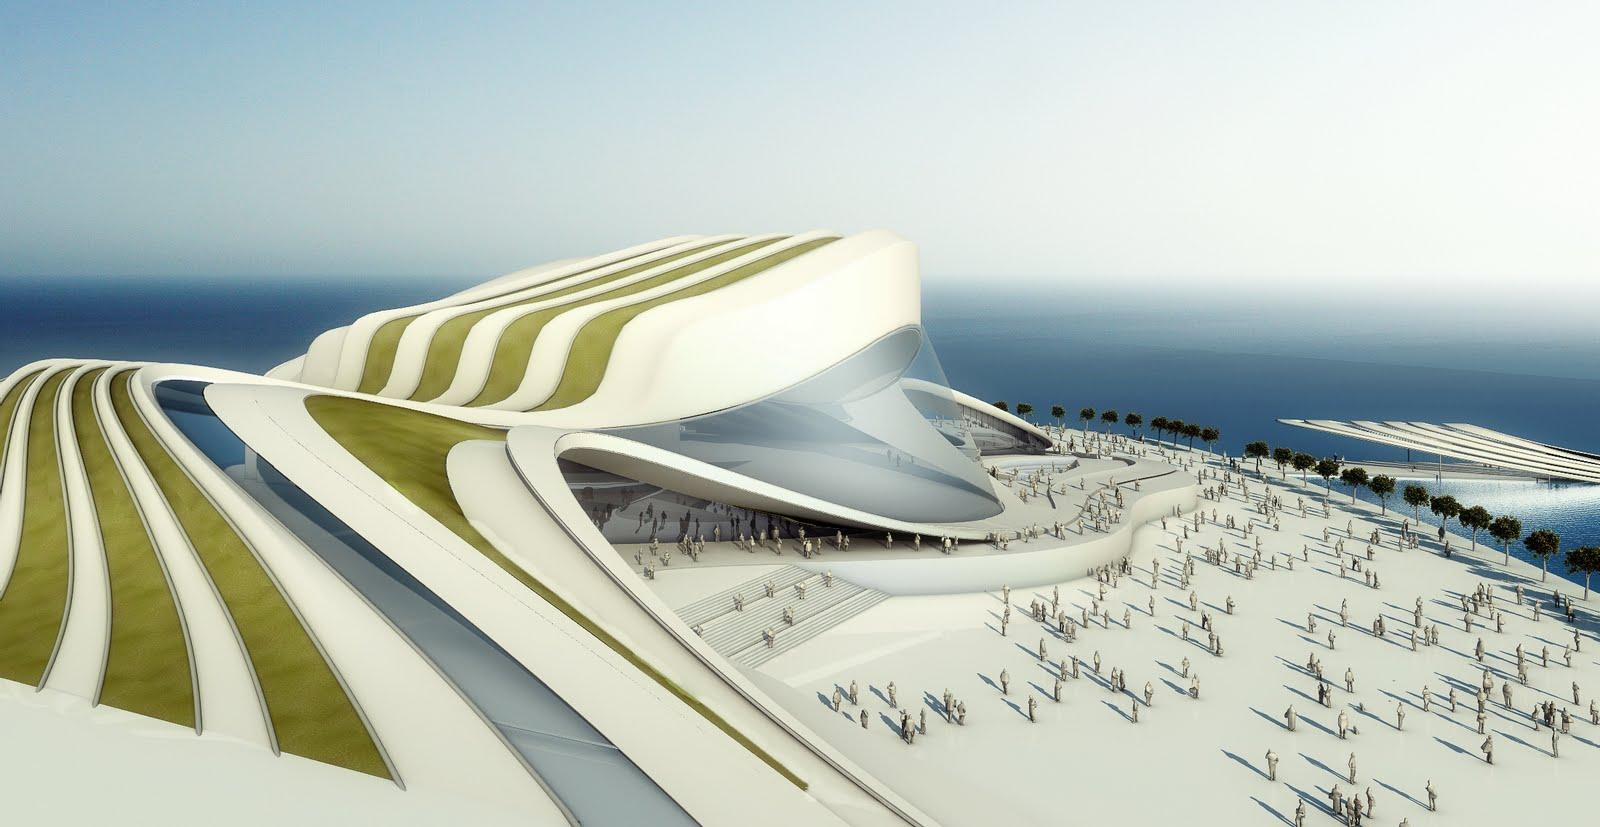 Busan Opera House By Diana Q De Saul & Alejendro Munevar